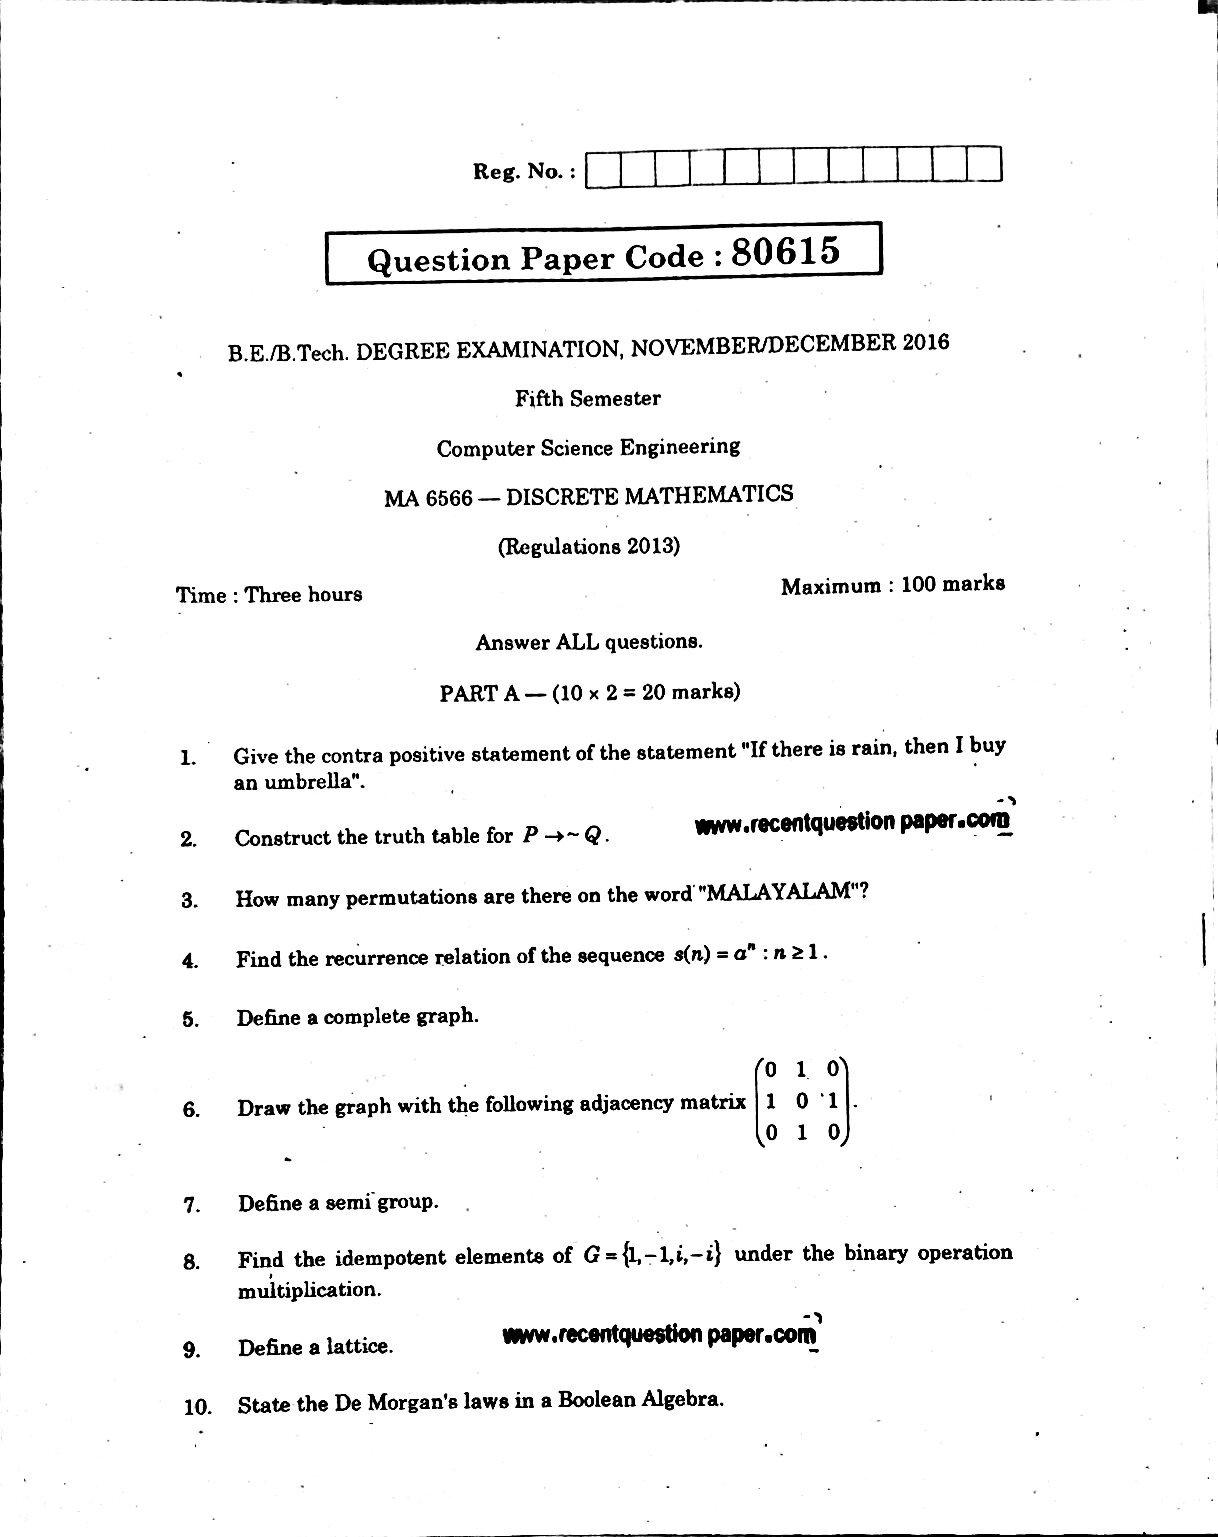 Discrete Mathematics Anna University Question paper Nov/Dec 2016